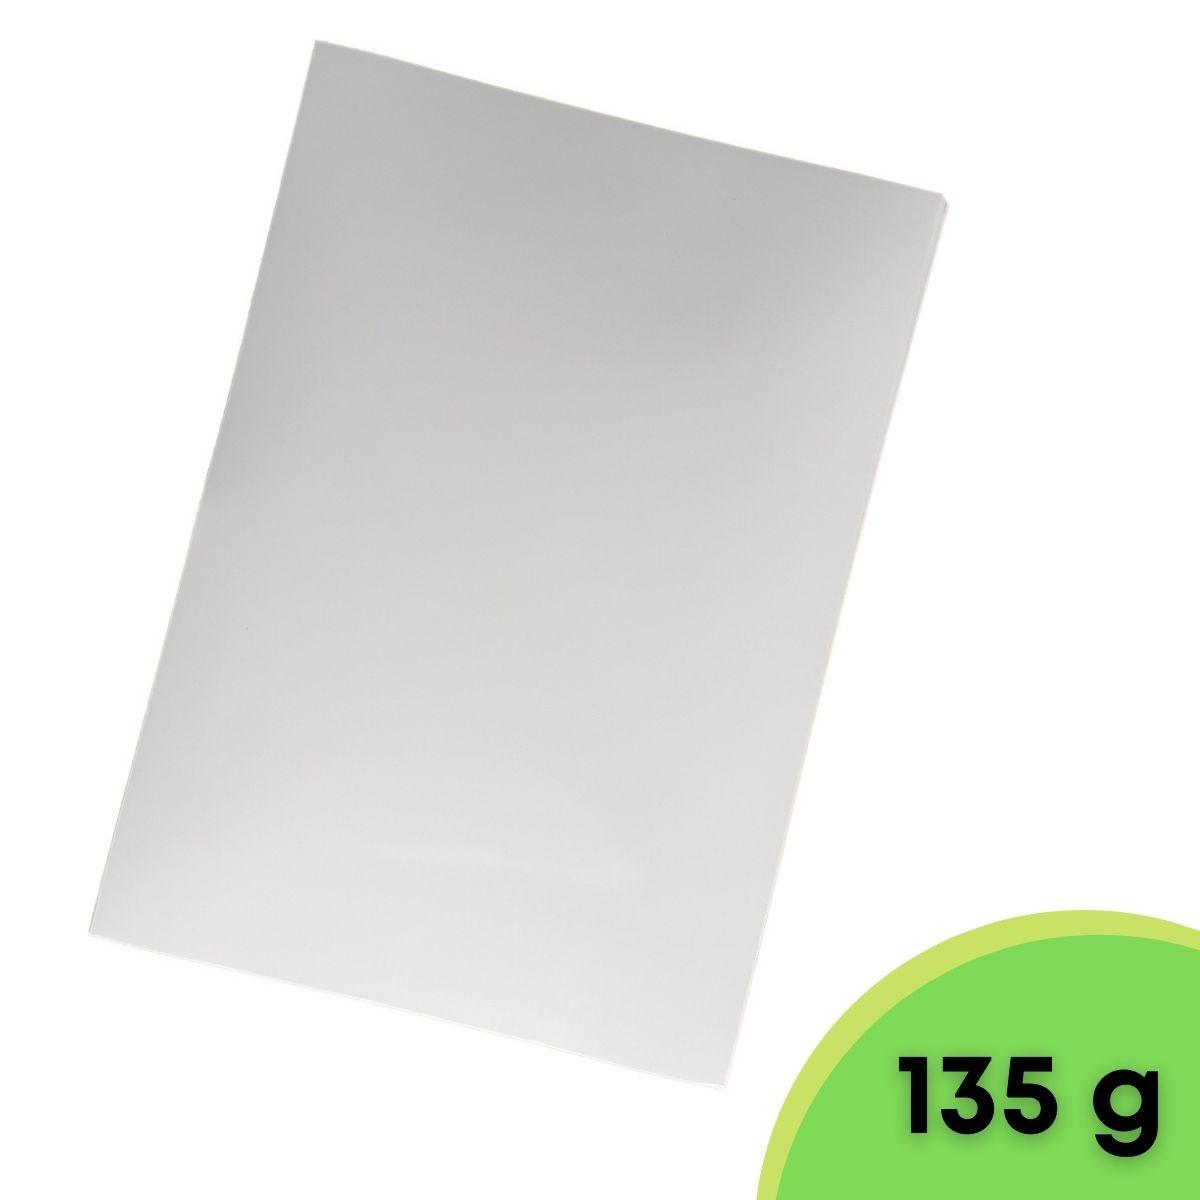 Papel Adesivo Fotografico 135gr 20 Folhas A4 Glossy Brilho Adesivado